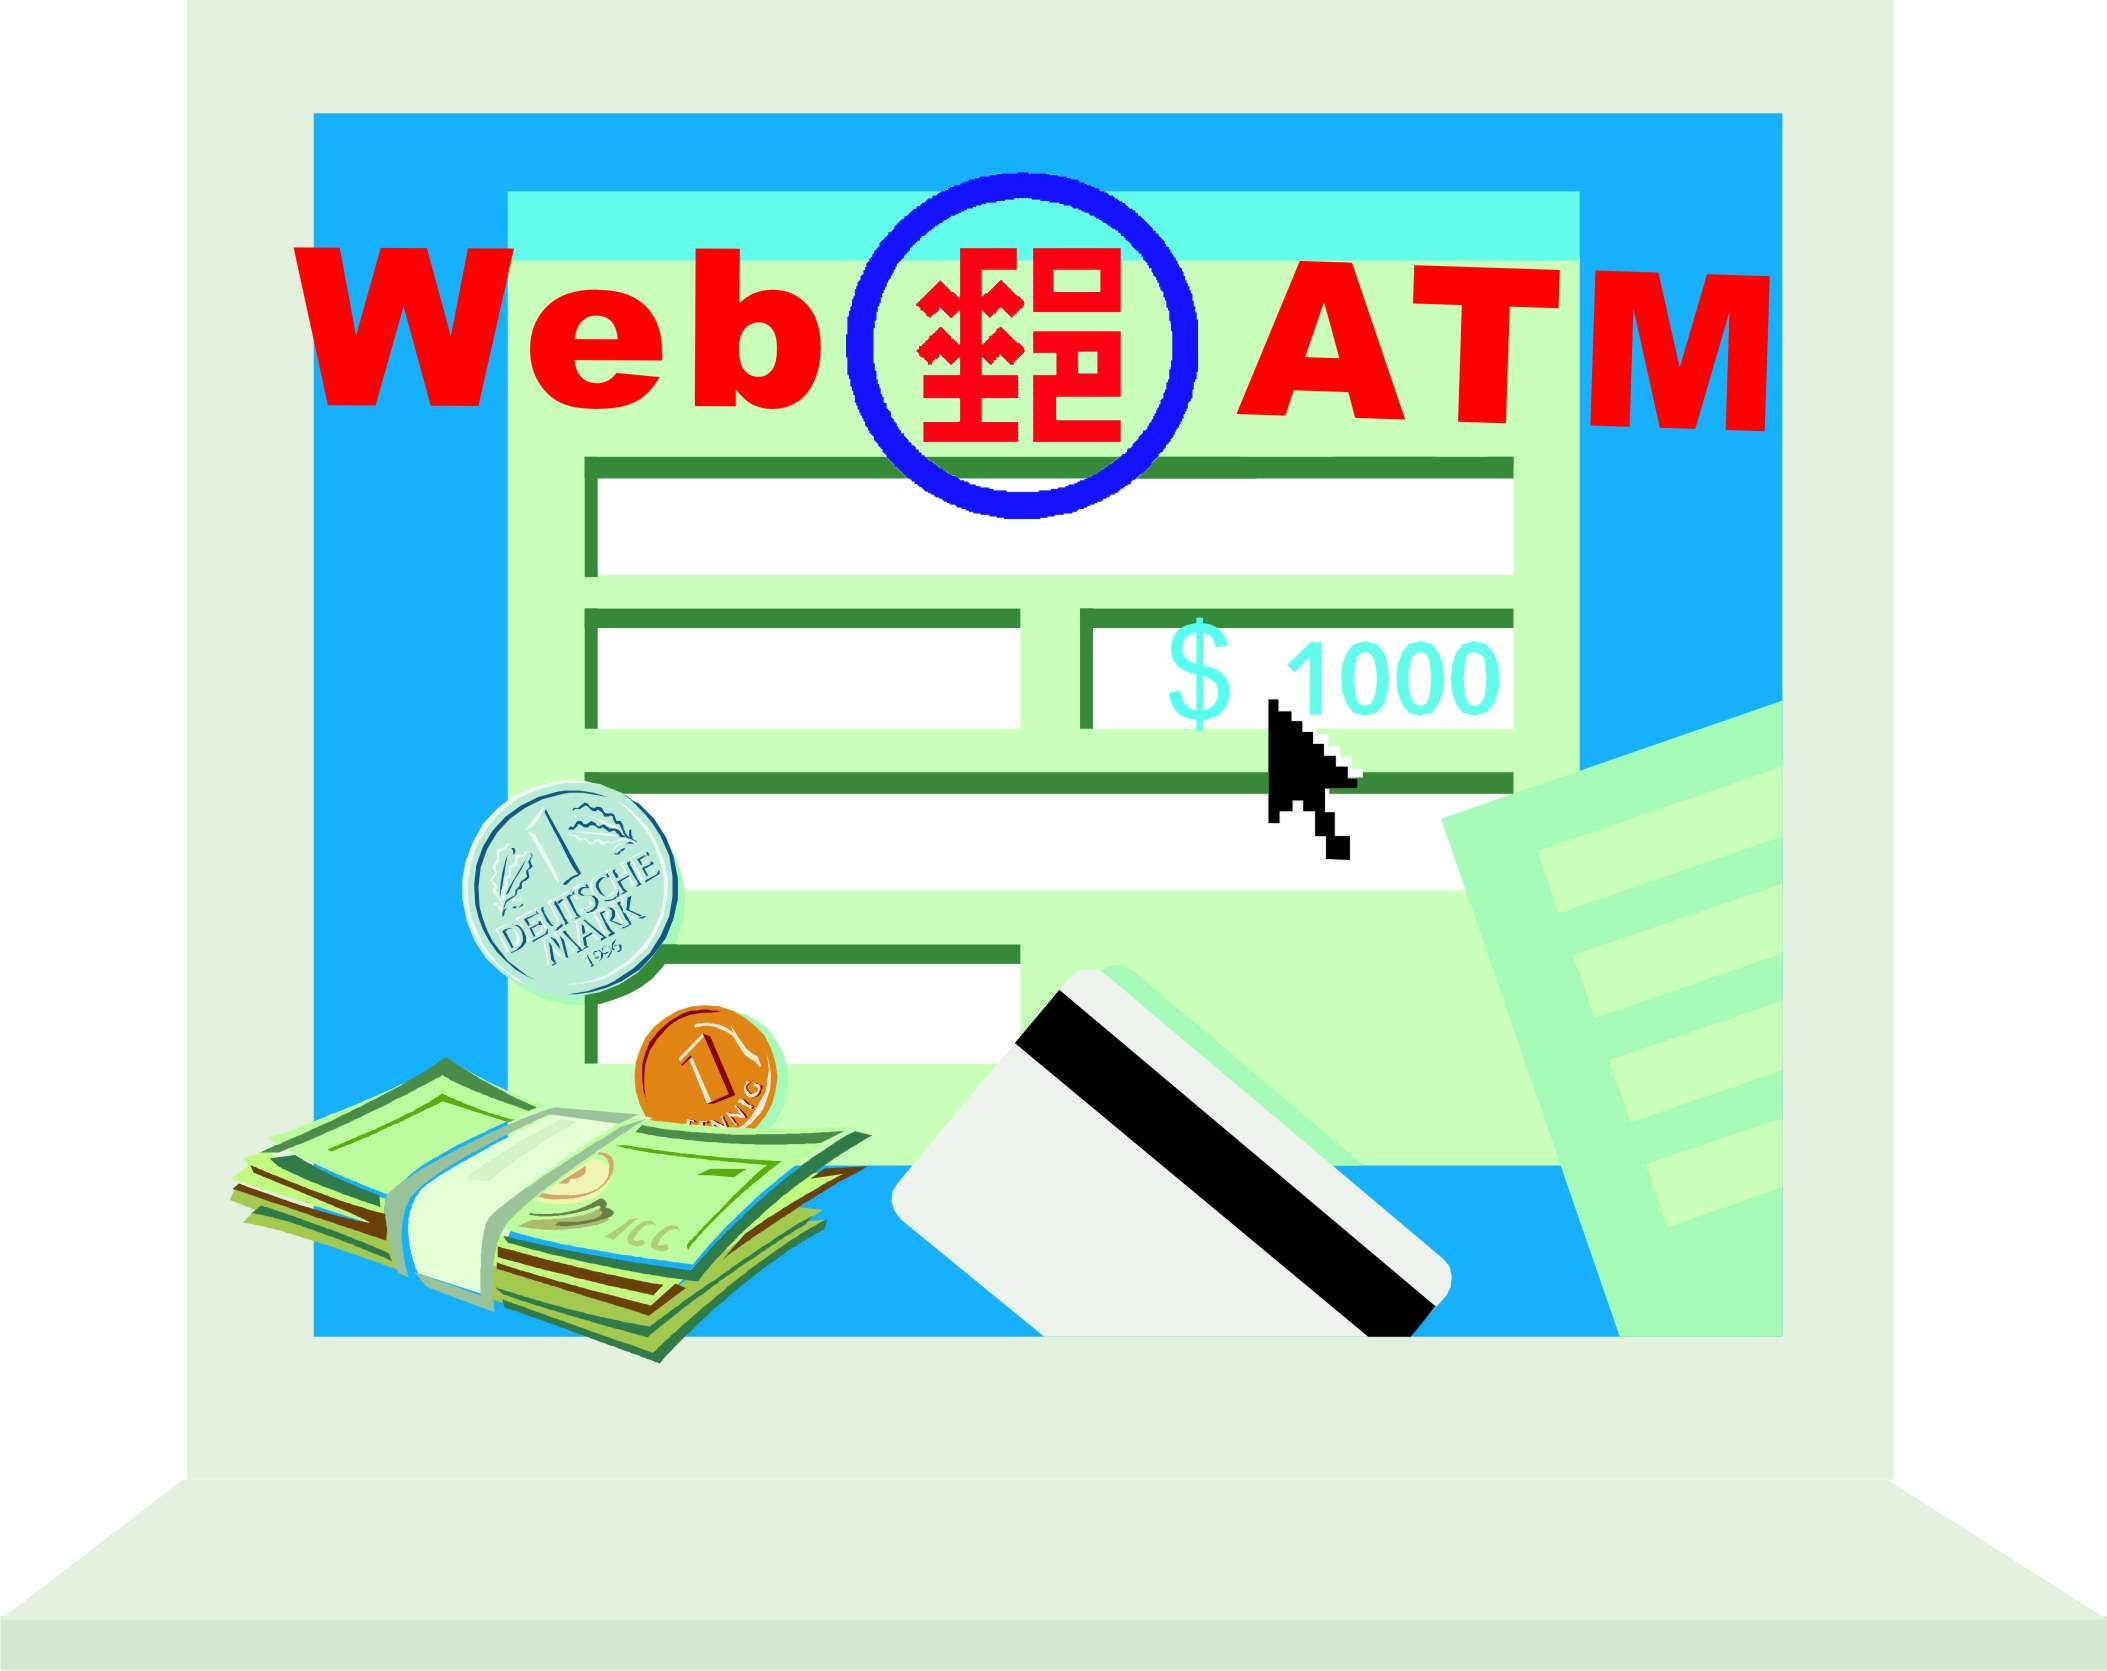 網路ATM